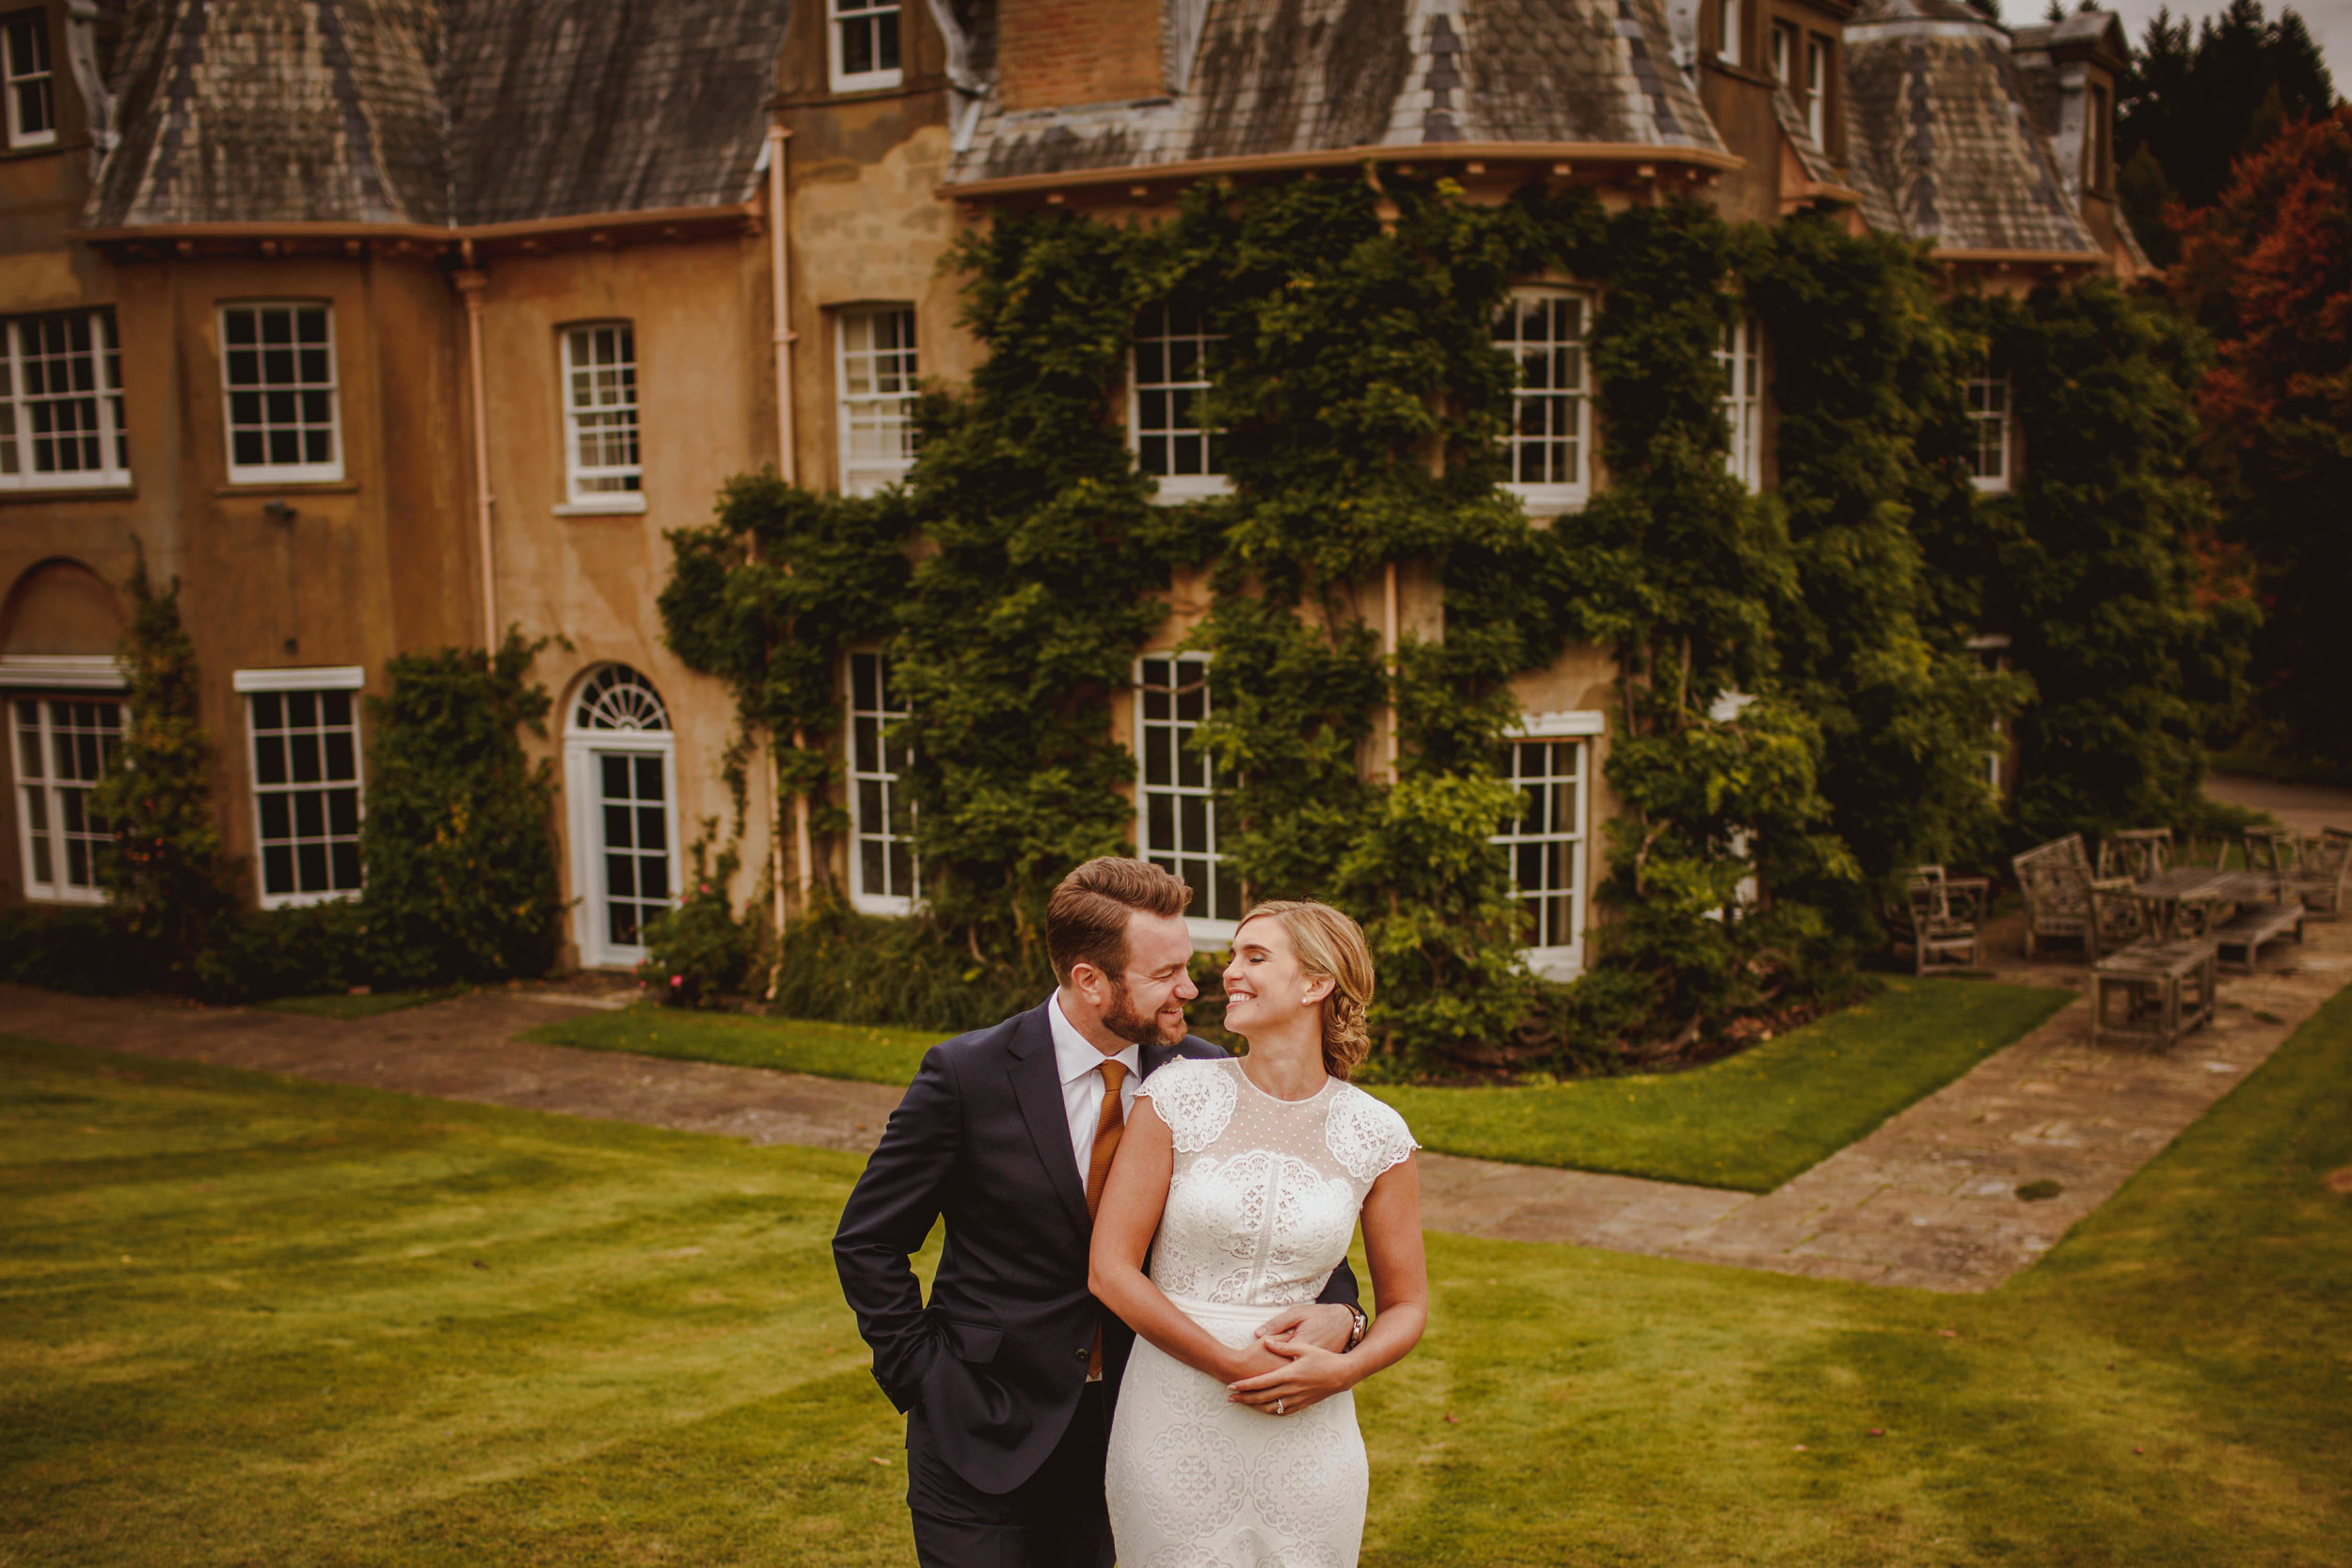 Surrey-wedding-photography-33.jpg